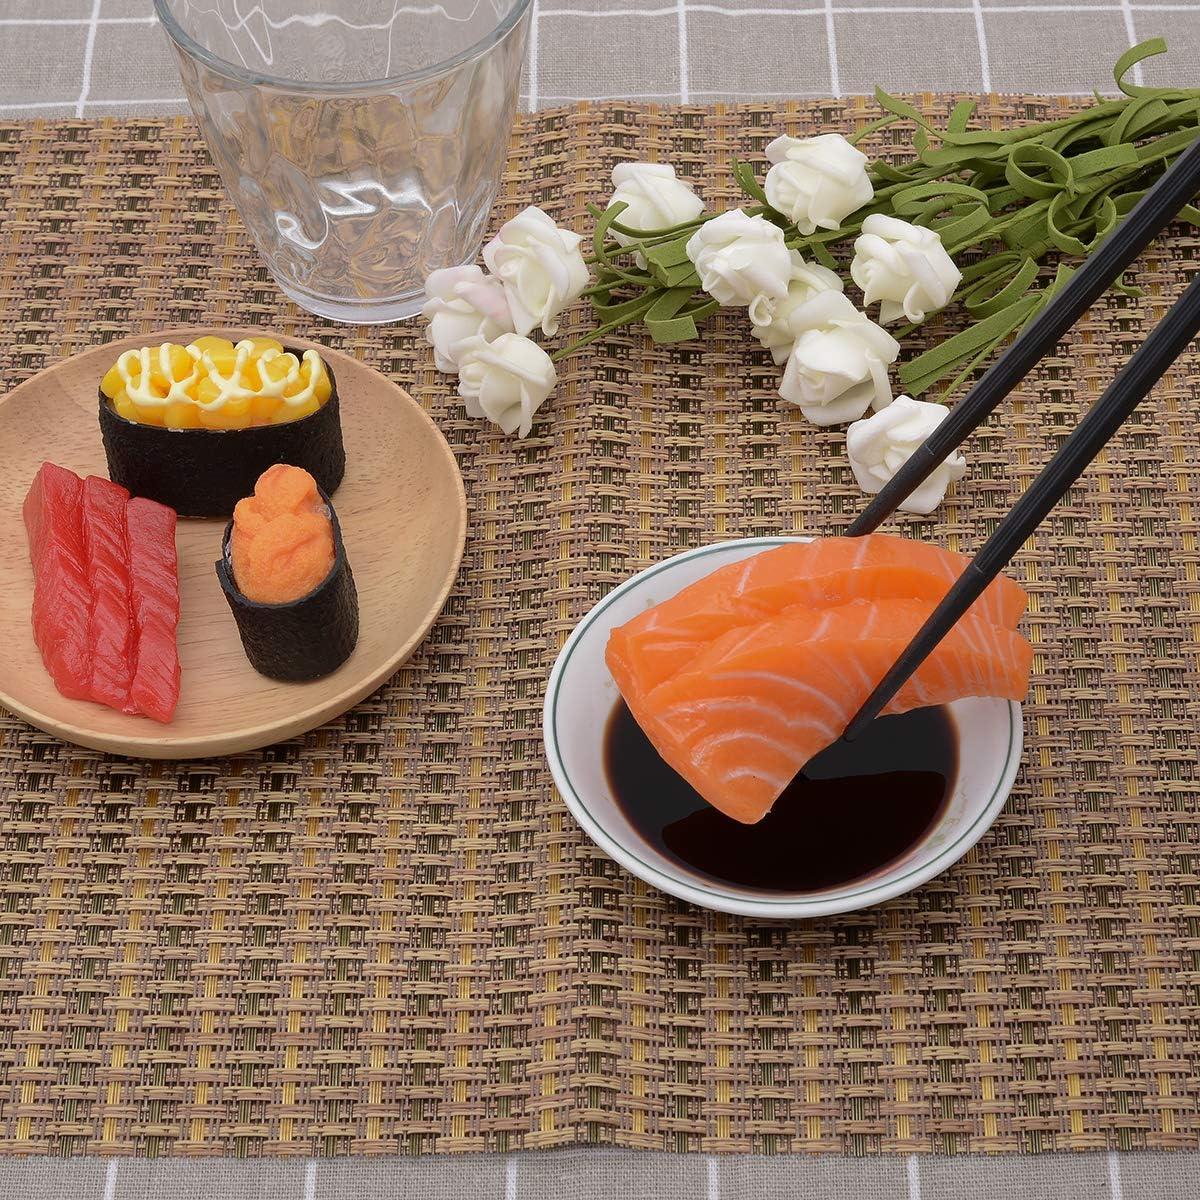 Five-color chopsticks 9 1//2 Inches 5-Pairs Fiberglass Chopsticks,Reusable Chopsticks Dishwasher Safe